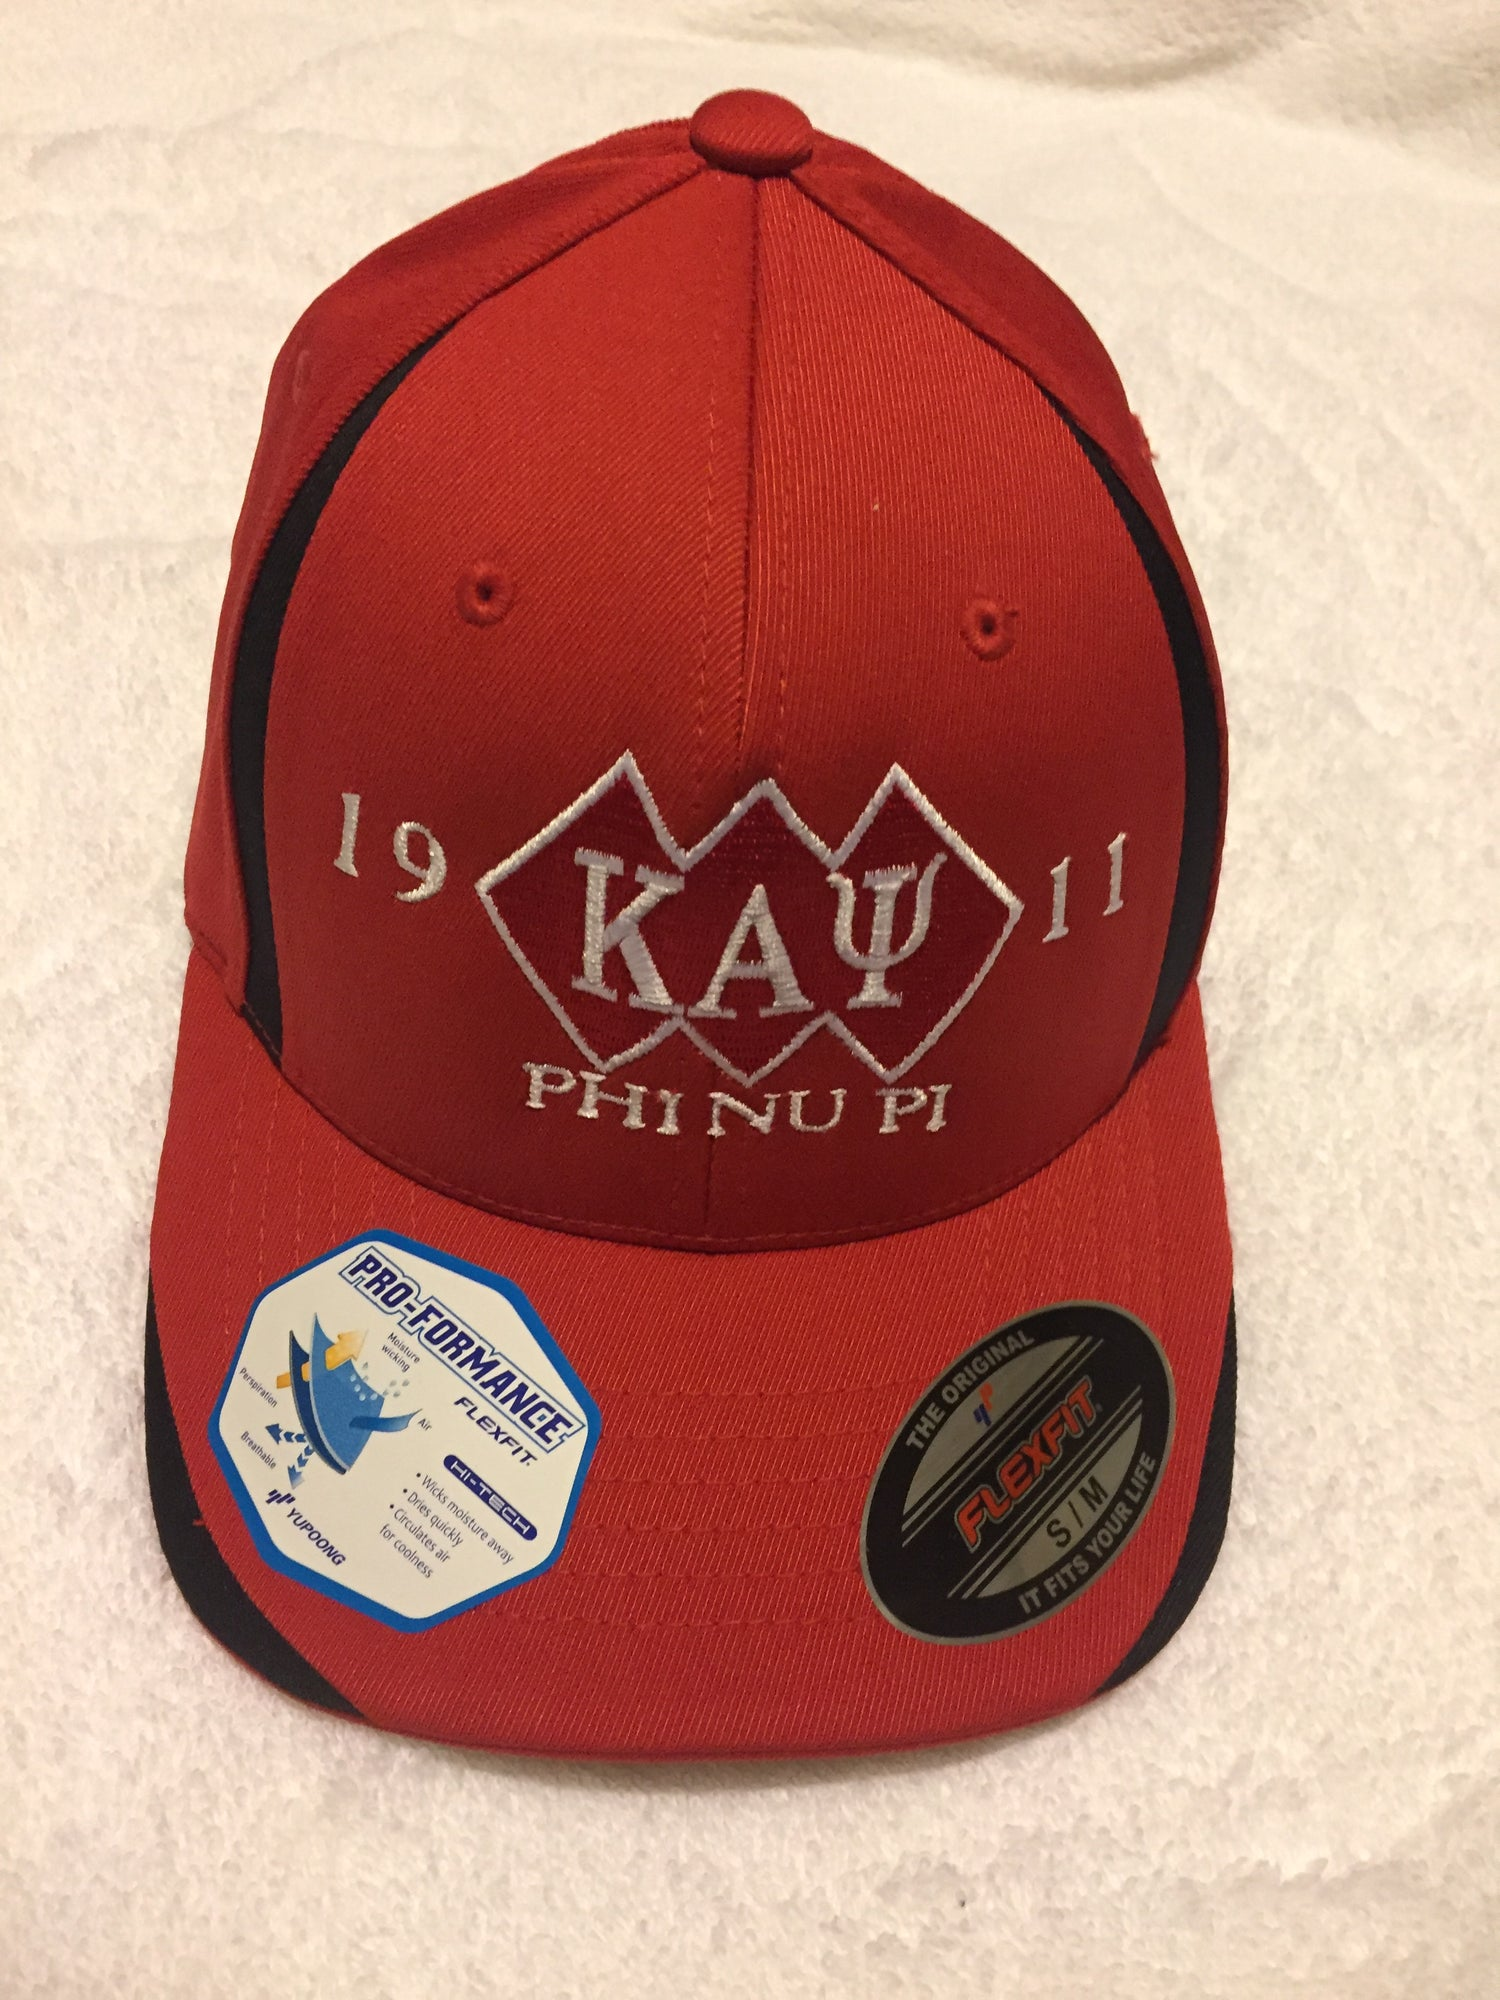 Image of Red & Black 3-Diamond Pro-Formance Flex Fit Cap